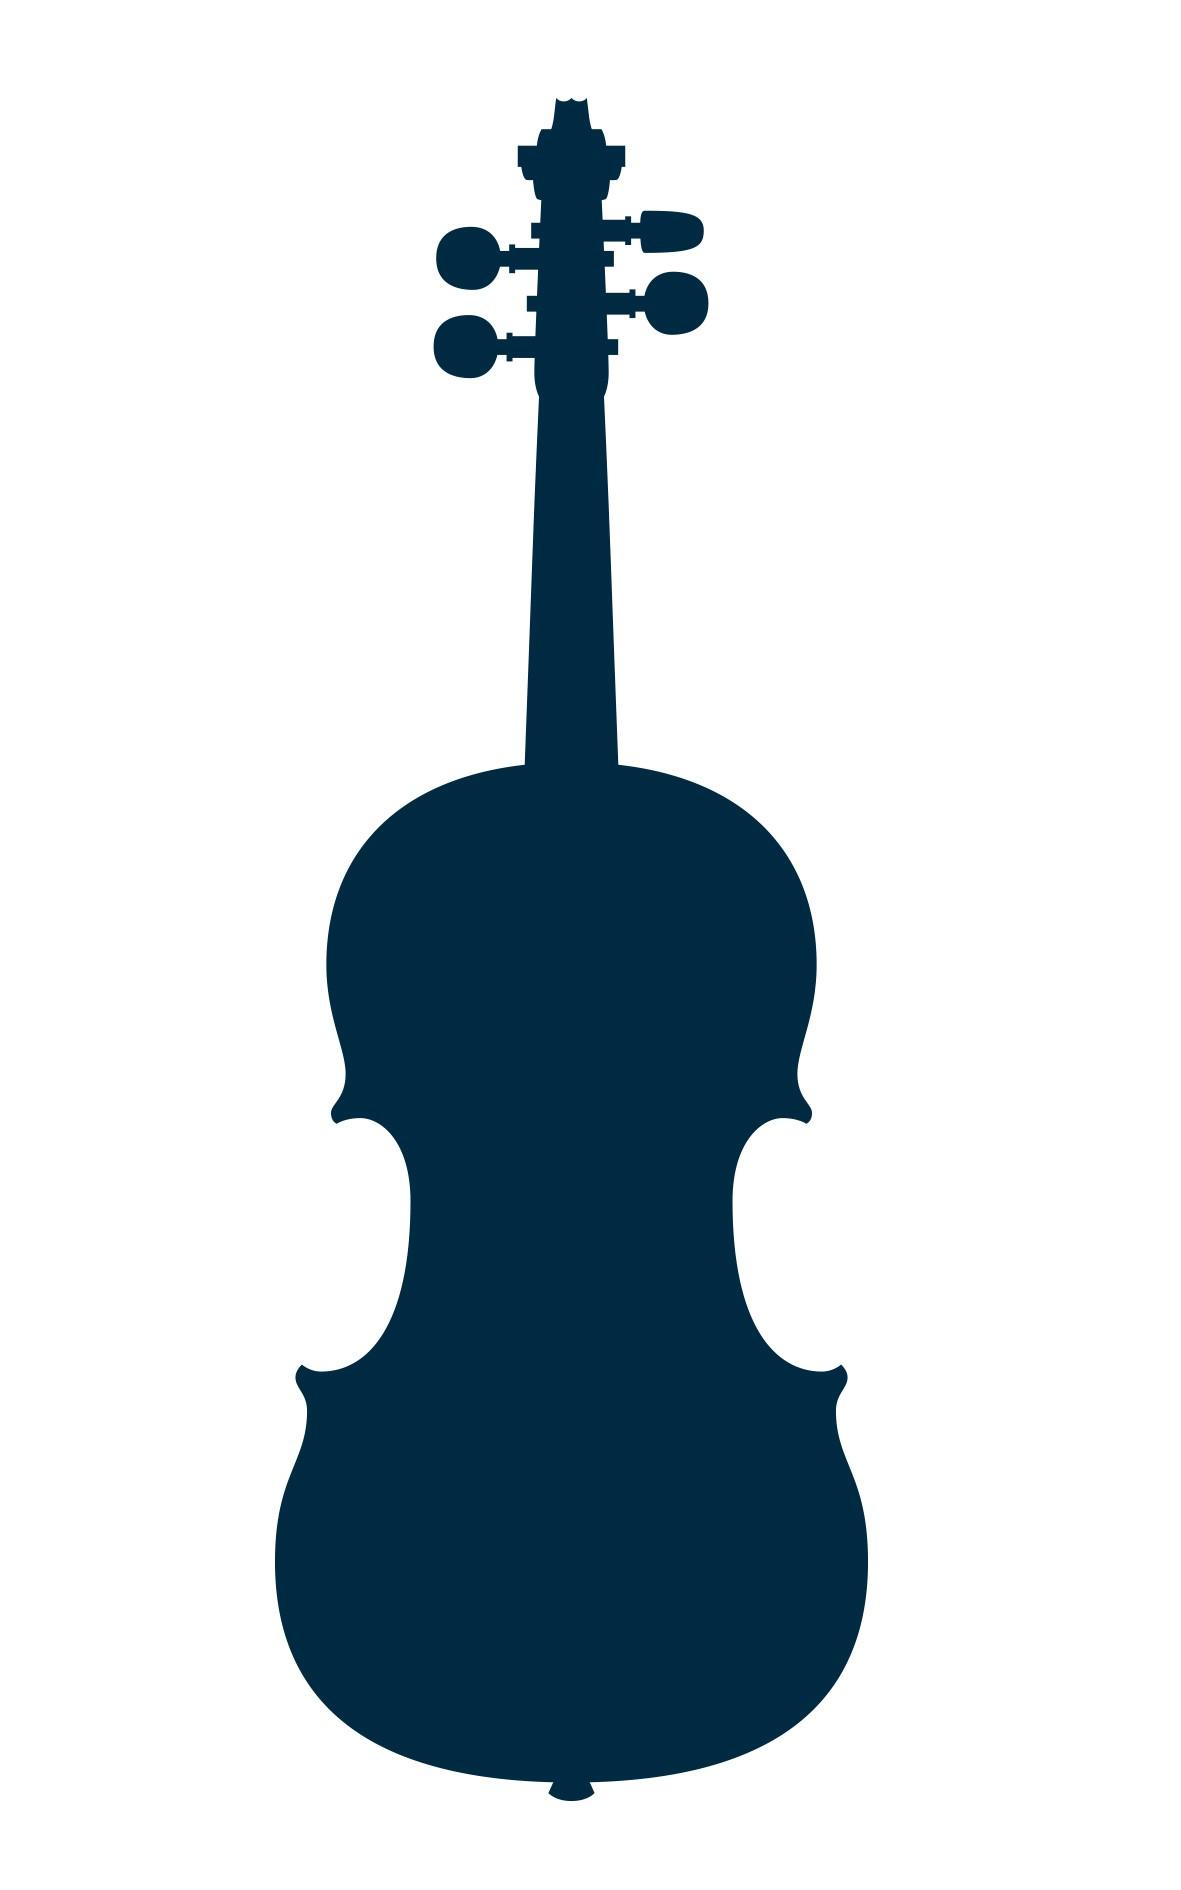 Mansuy violin, around 1900, Mirecourt